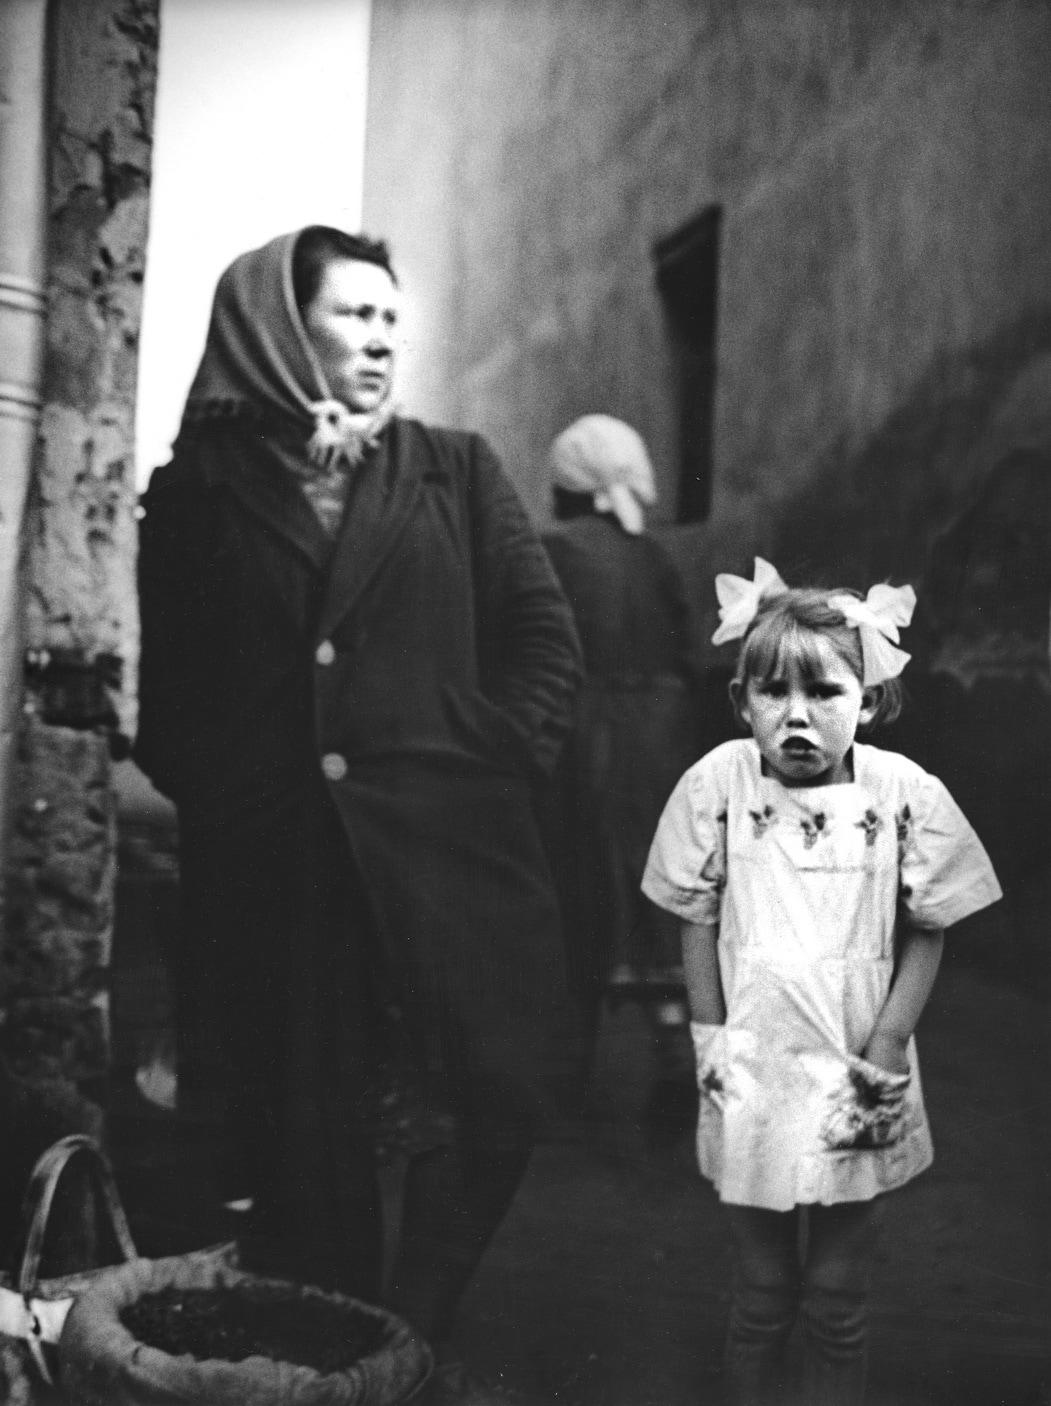 1963. Семечки, Москва. Рынок на площади Павелецкого вокзала